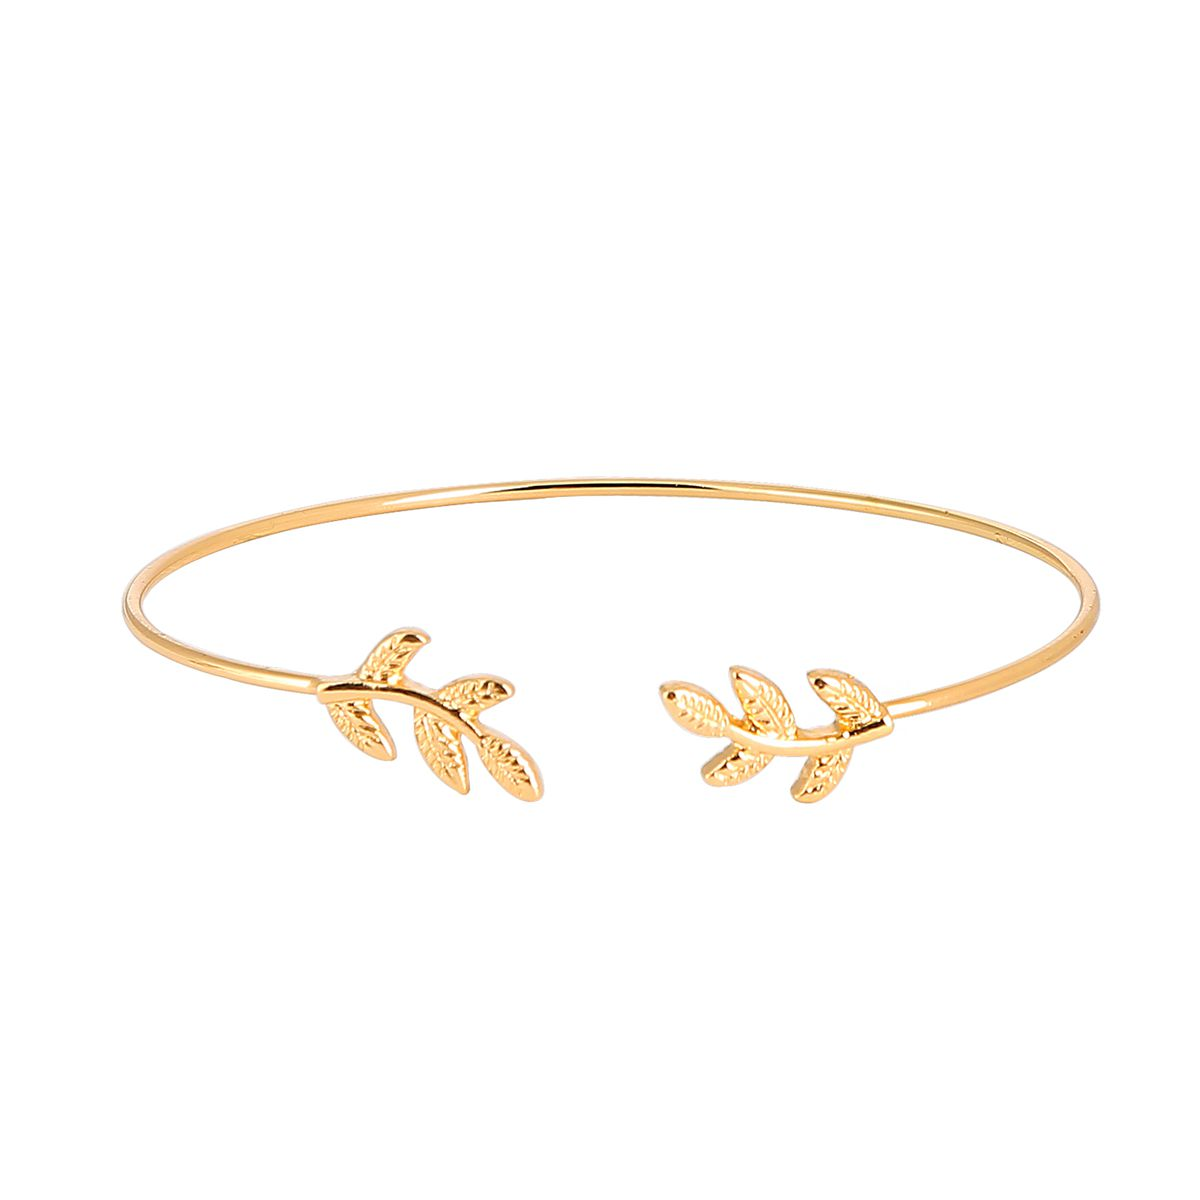 Leaf Copper Bead Opening Bracelet Alloy Plating Wild Fashion Jewelry Bracelet